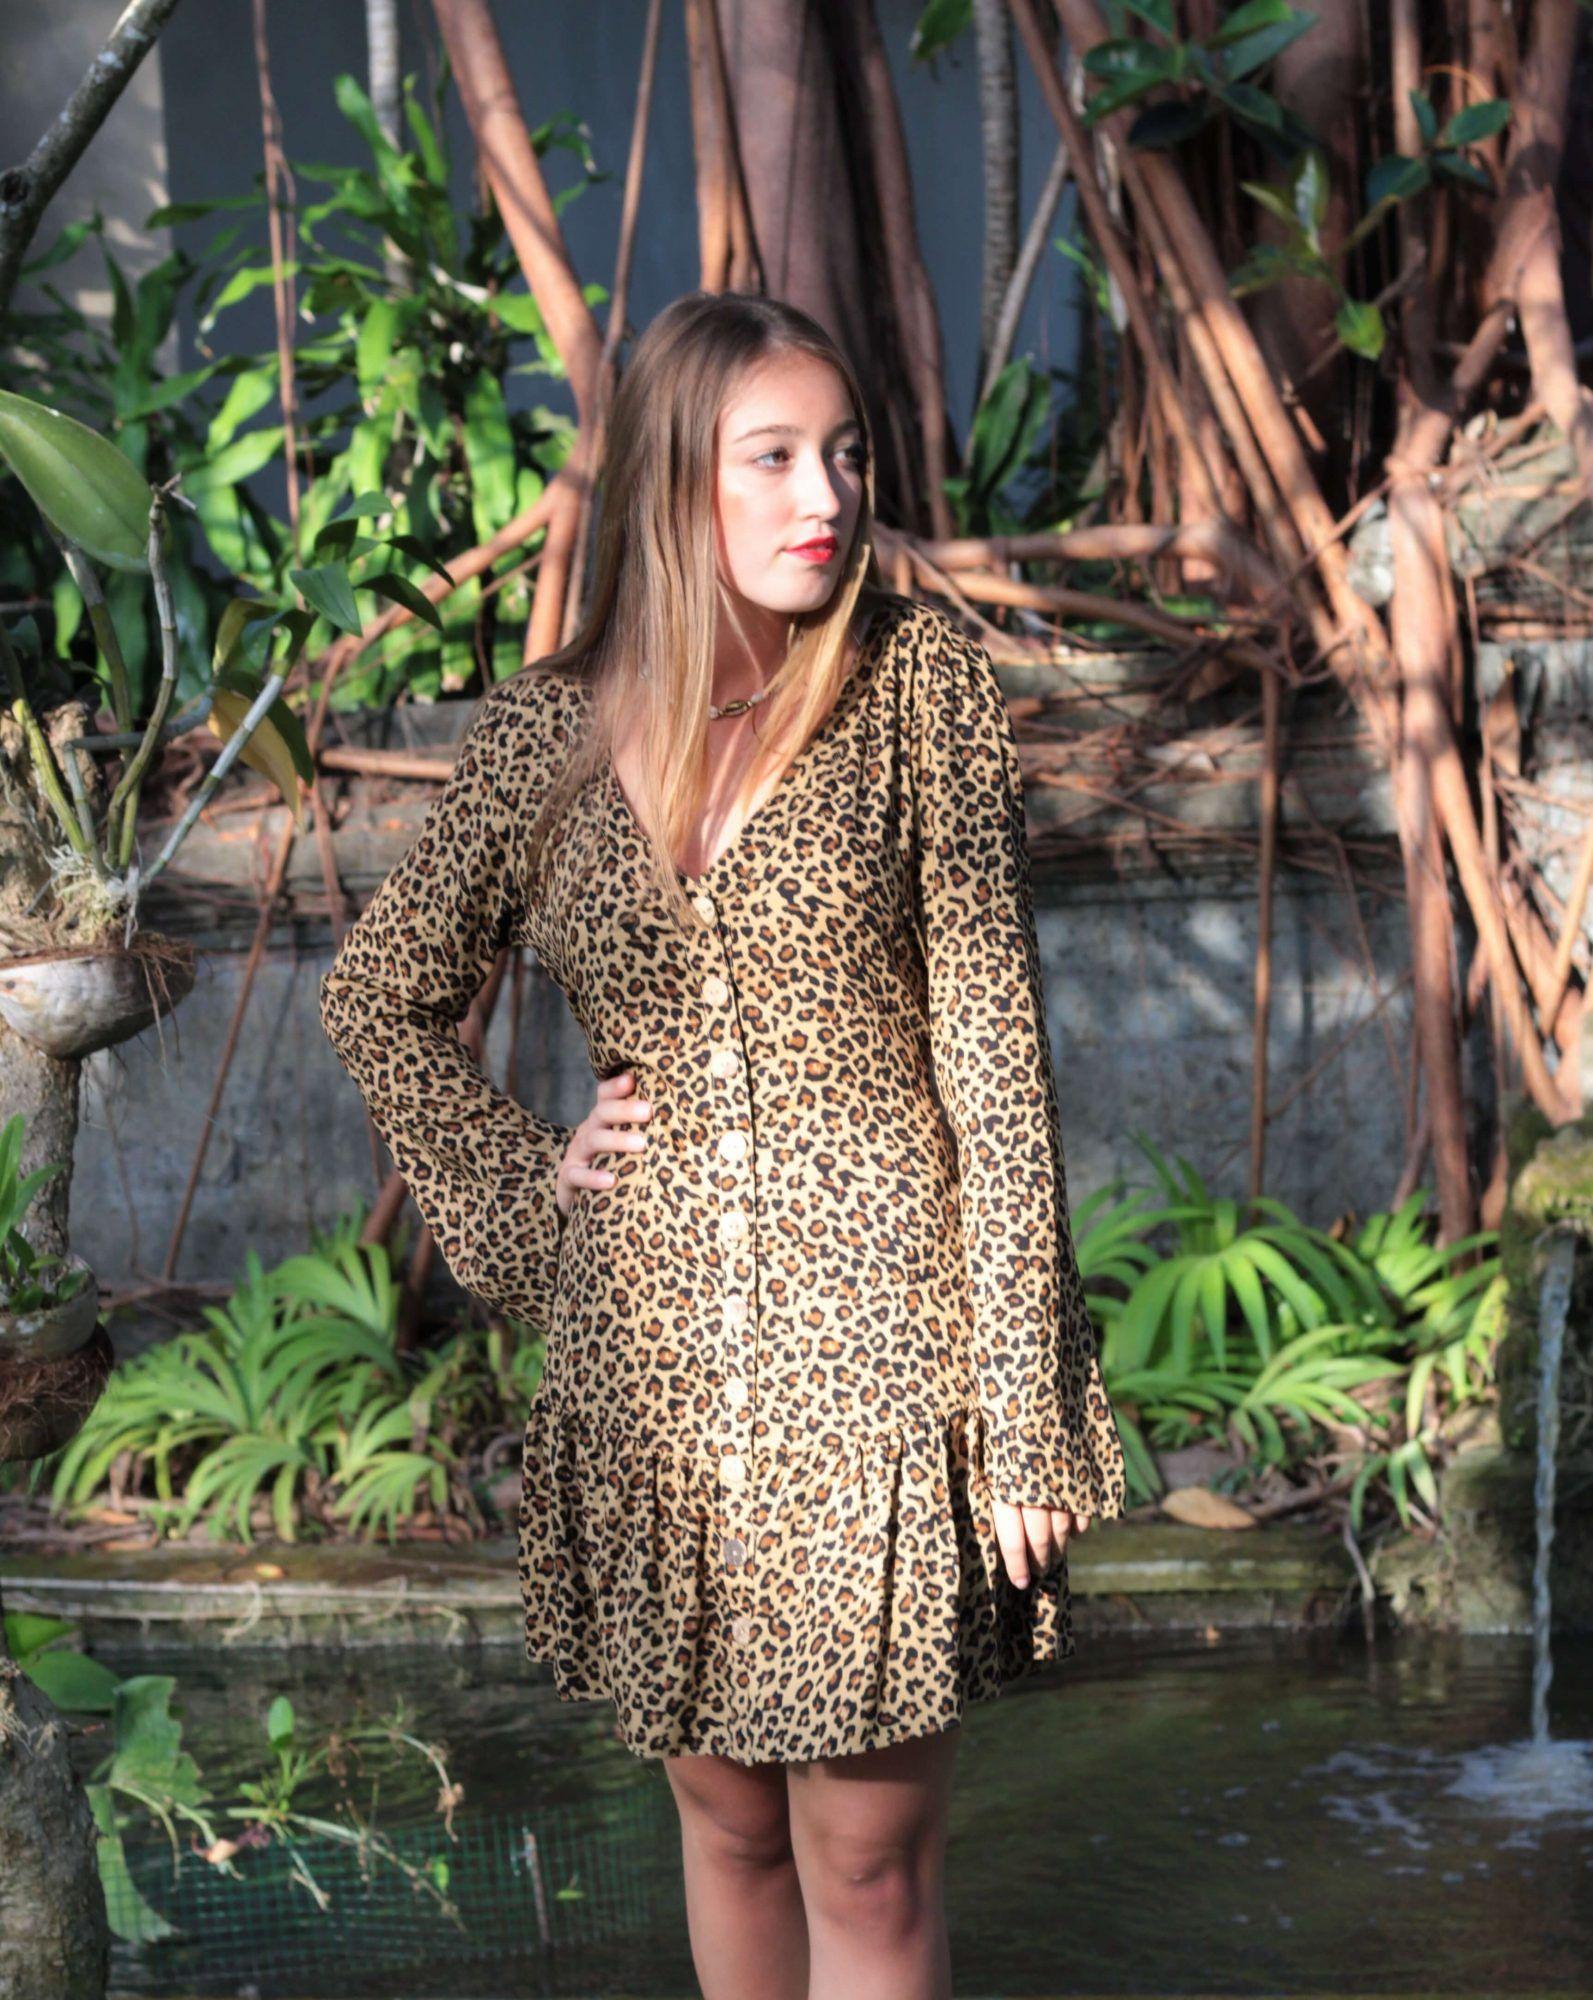 Leoparden-Kleid kurz - Boho Kleid kurz im Leo Print mit langen